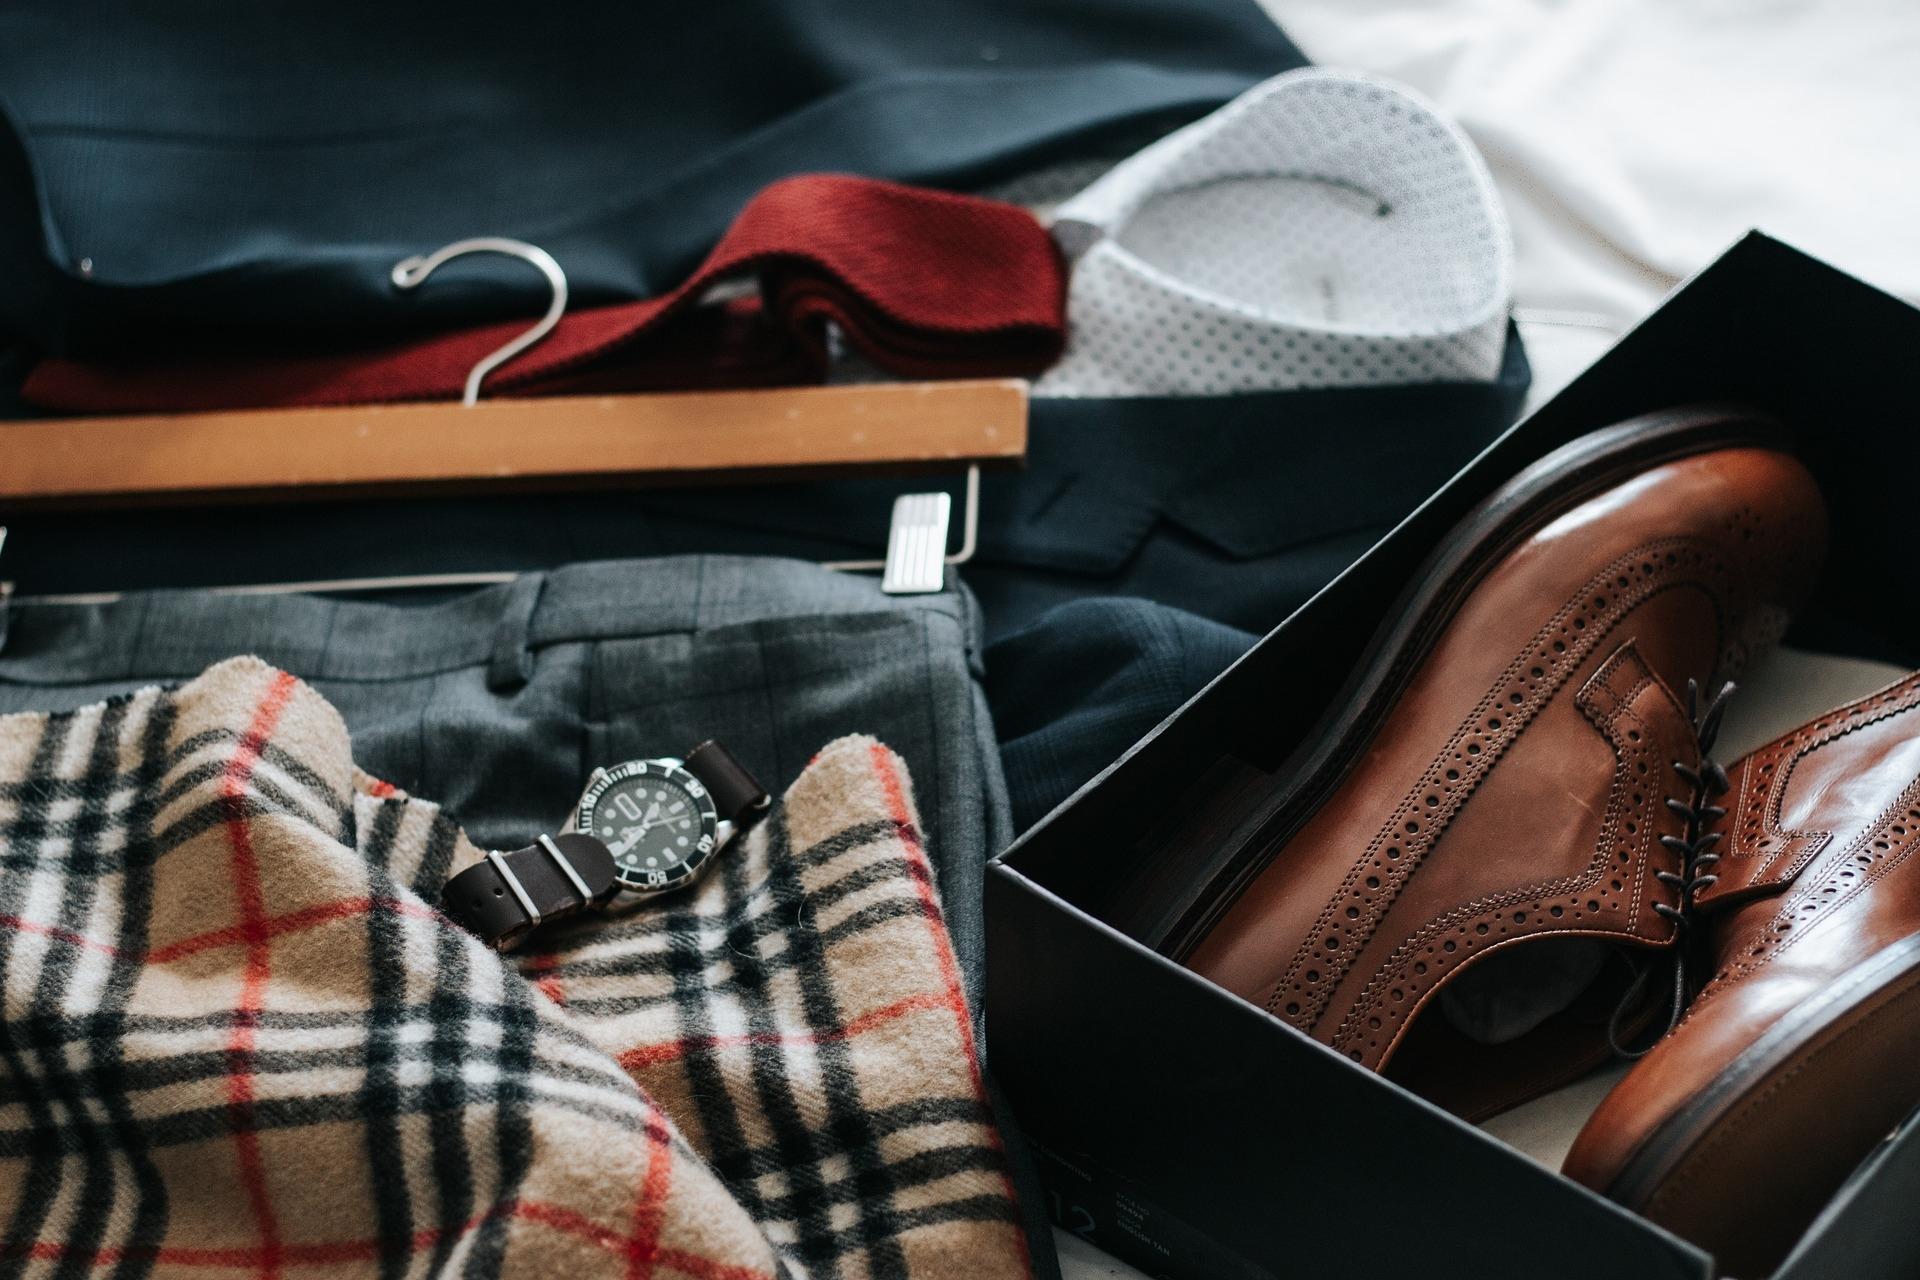 Ropa personalizada para empresas  (@ropa-personalizada-empresas) Cover Image